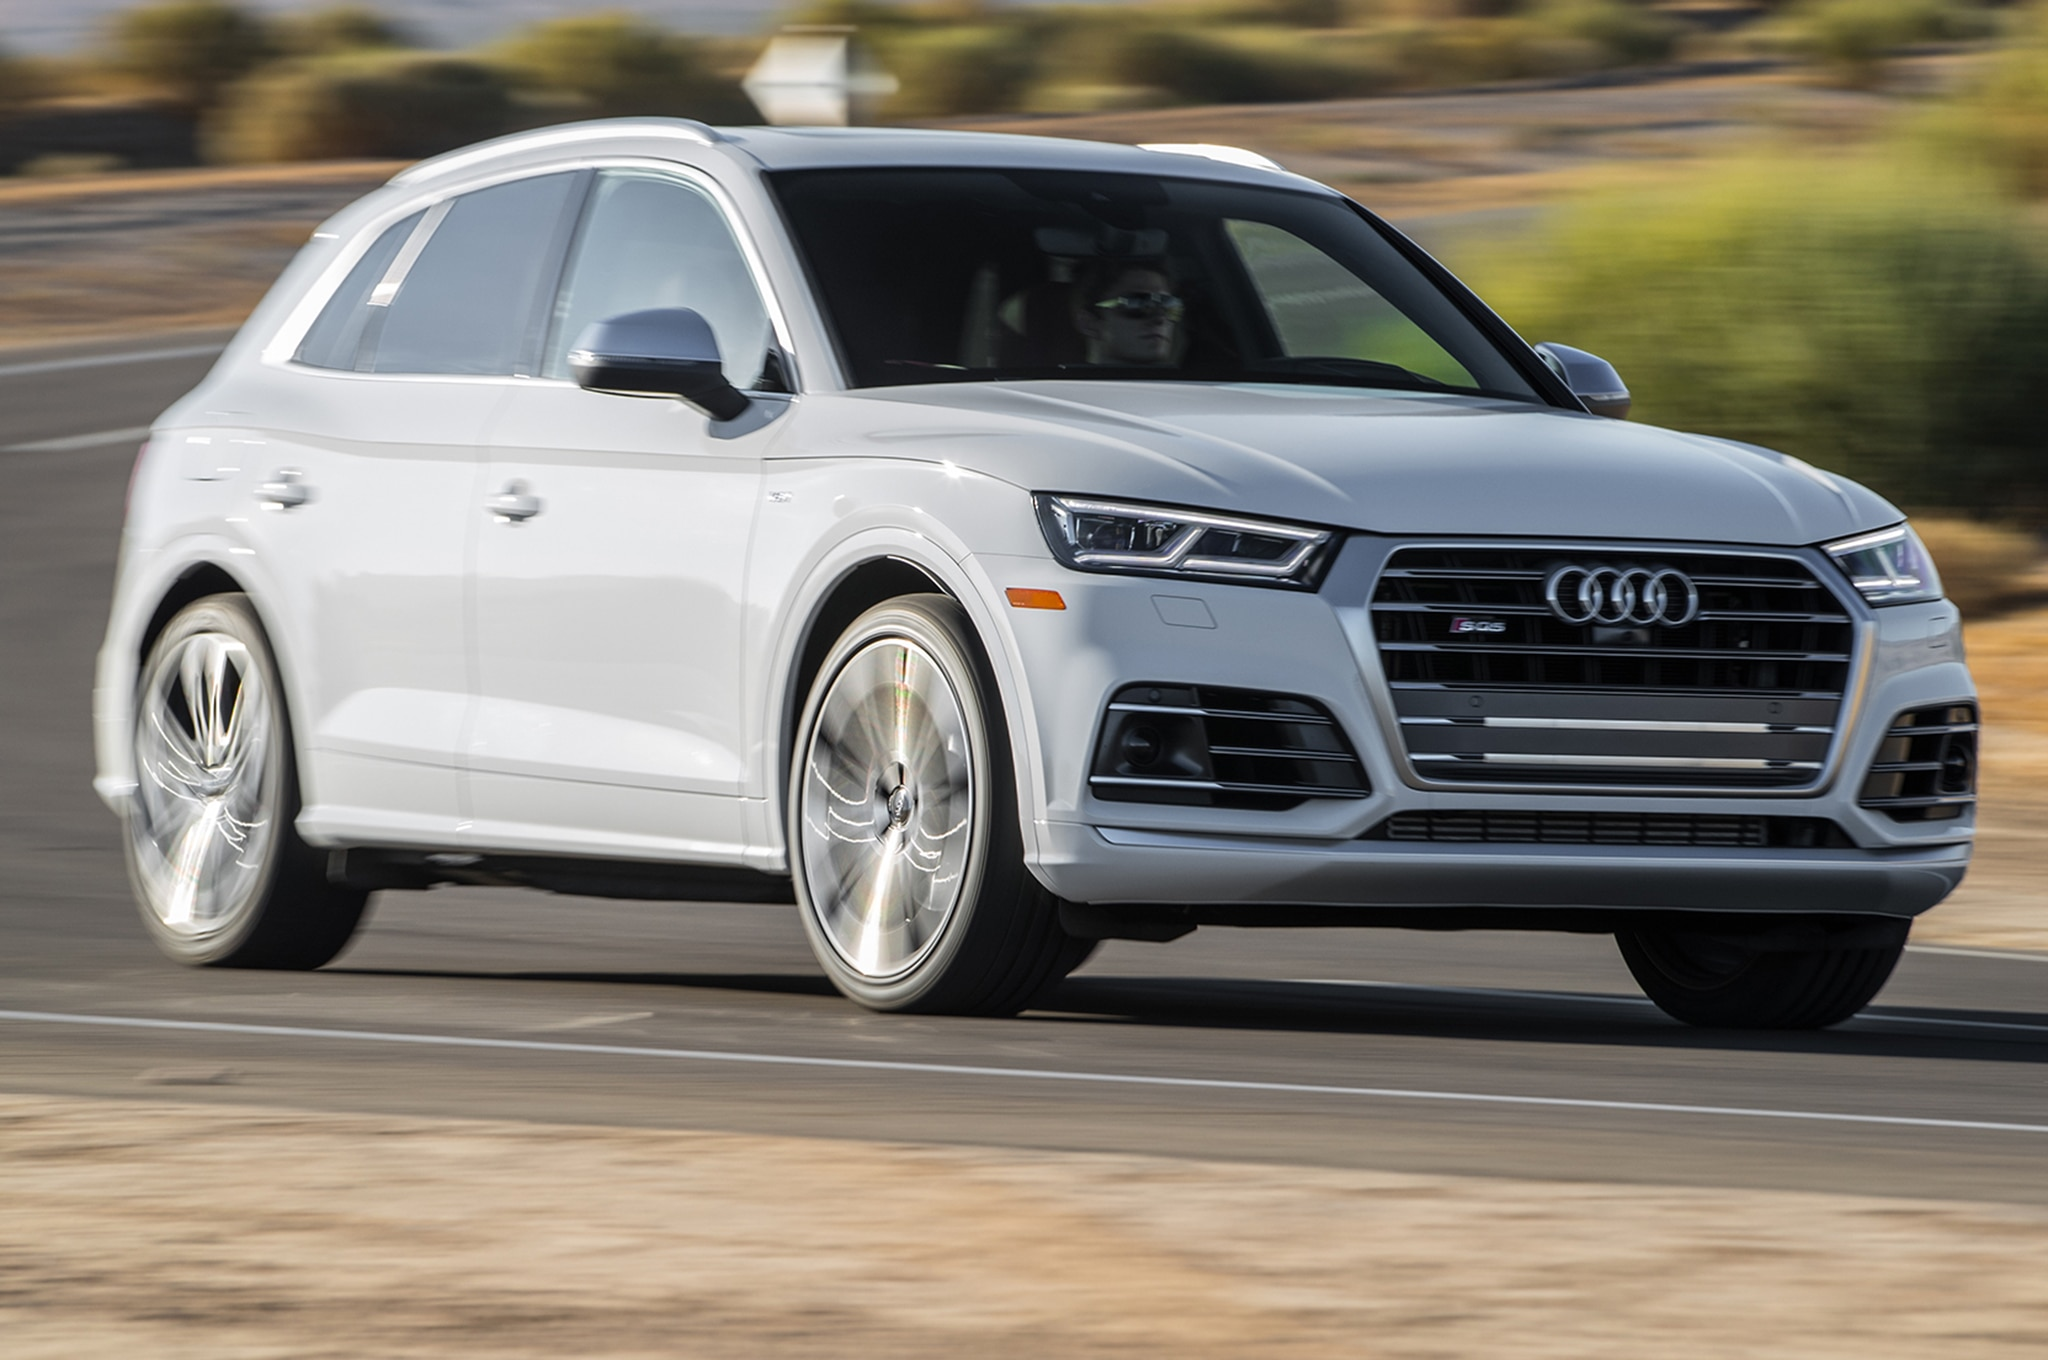 2018 Audi SQ5 V6 T Front Three Quarter In Motion 00